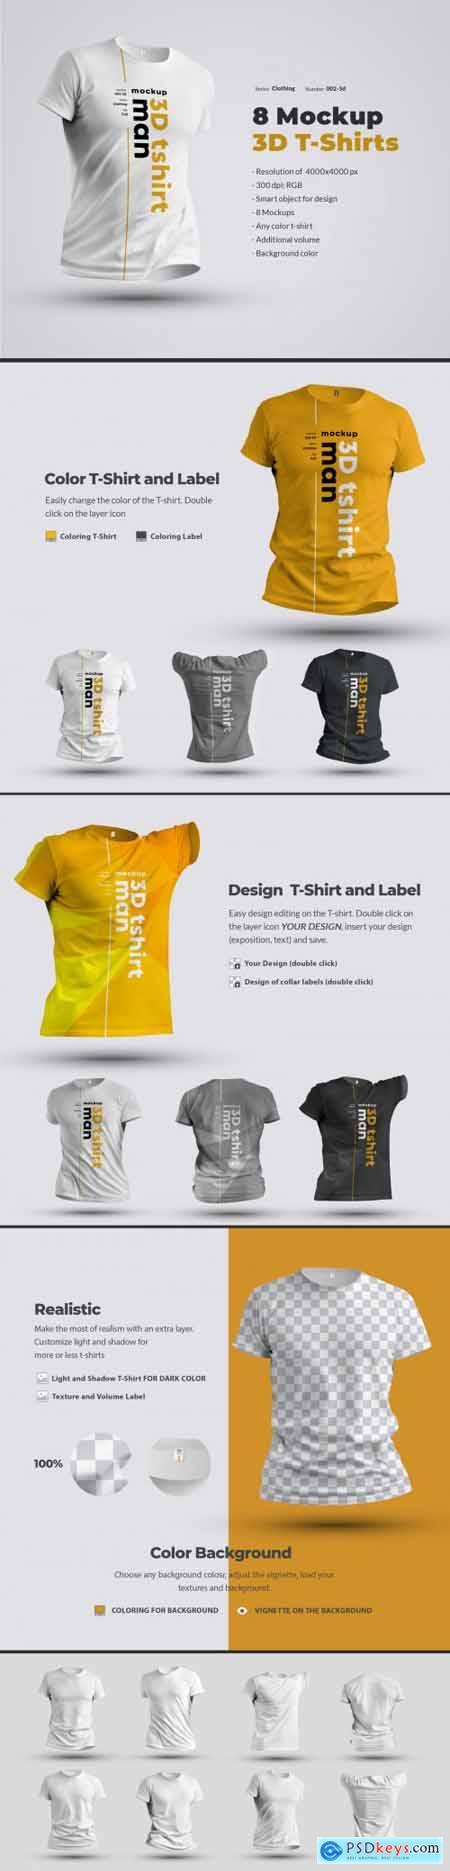 8 Mockups 3D T-Shirts 53350